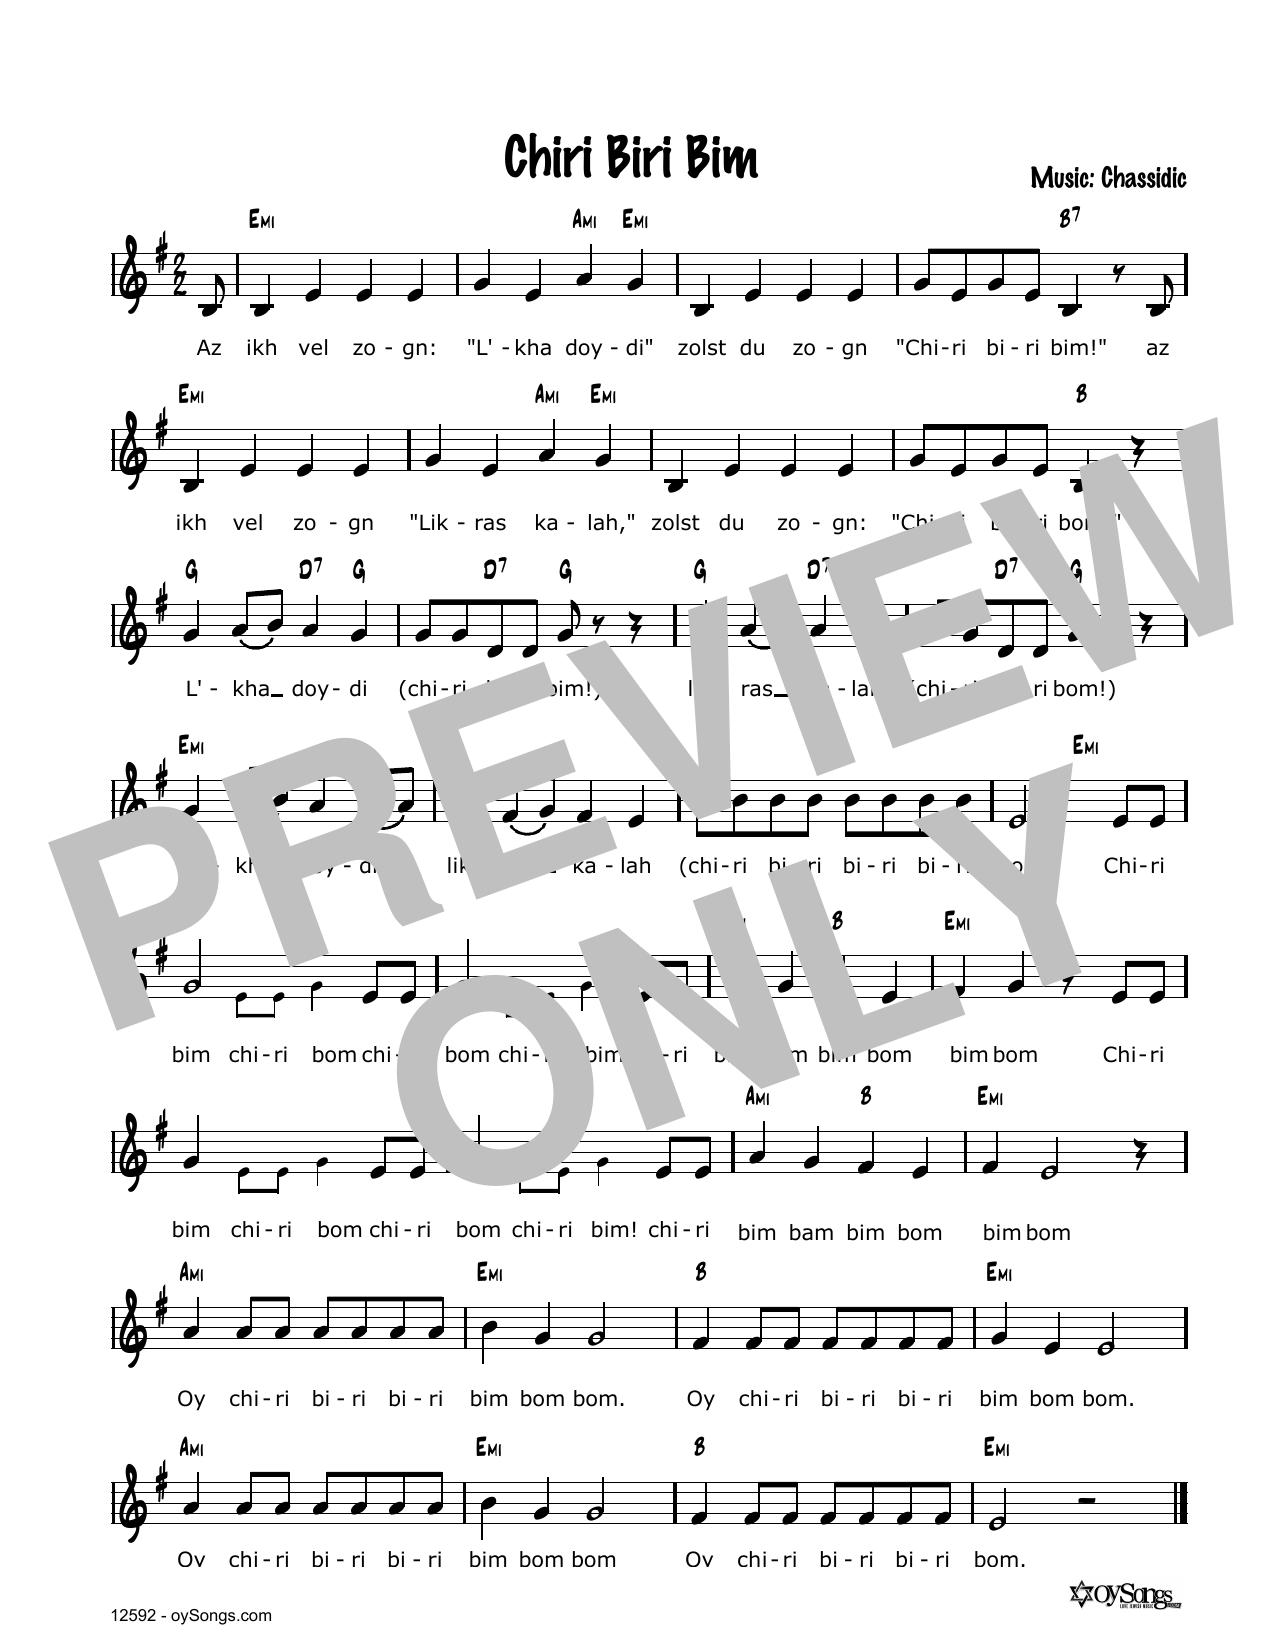 Cindy Paley Chiri Biri Bam sheet music notes and chords. Download Printable PDF.